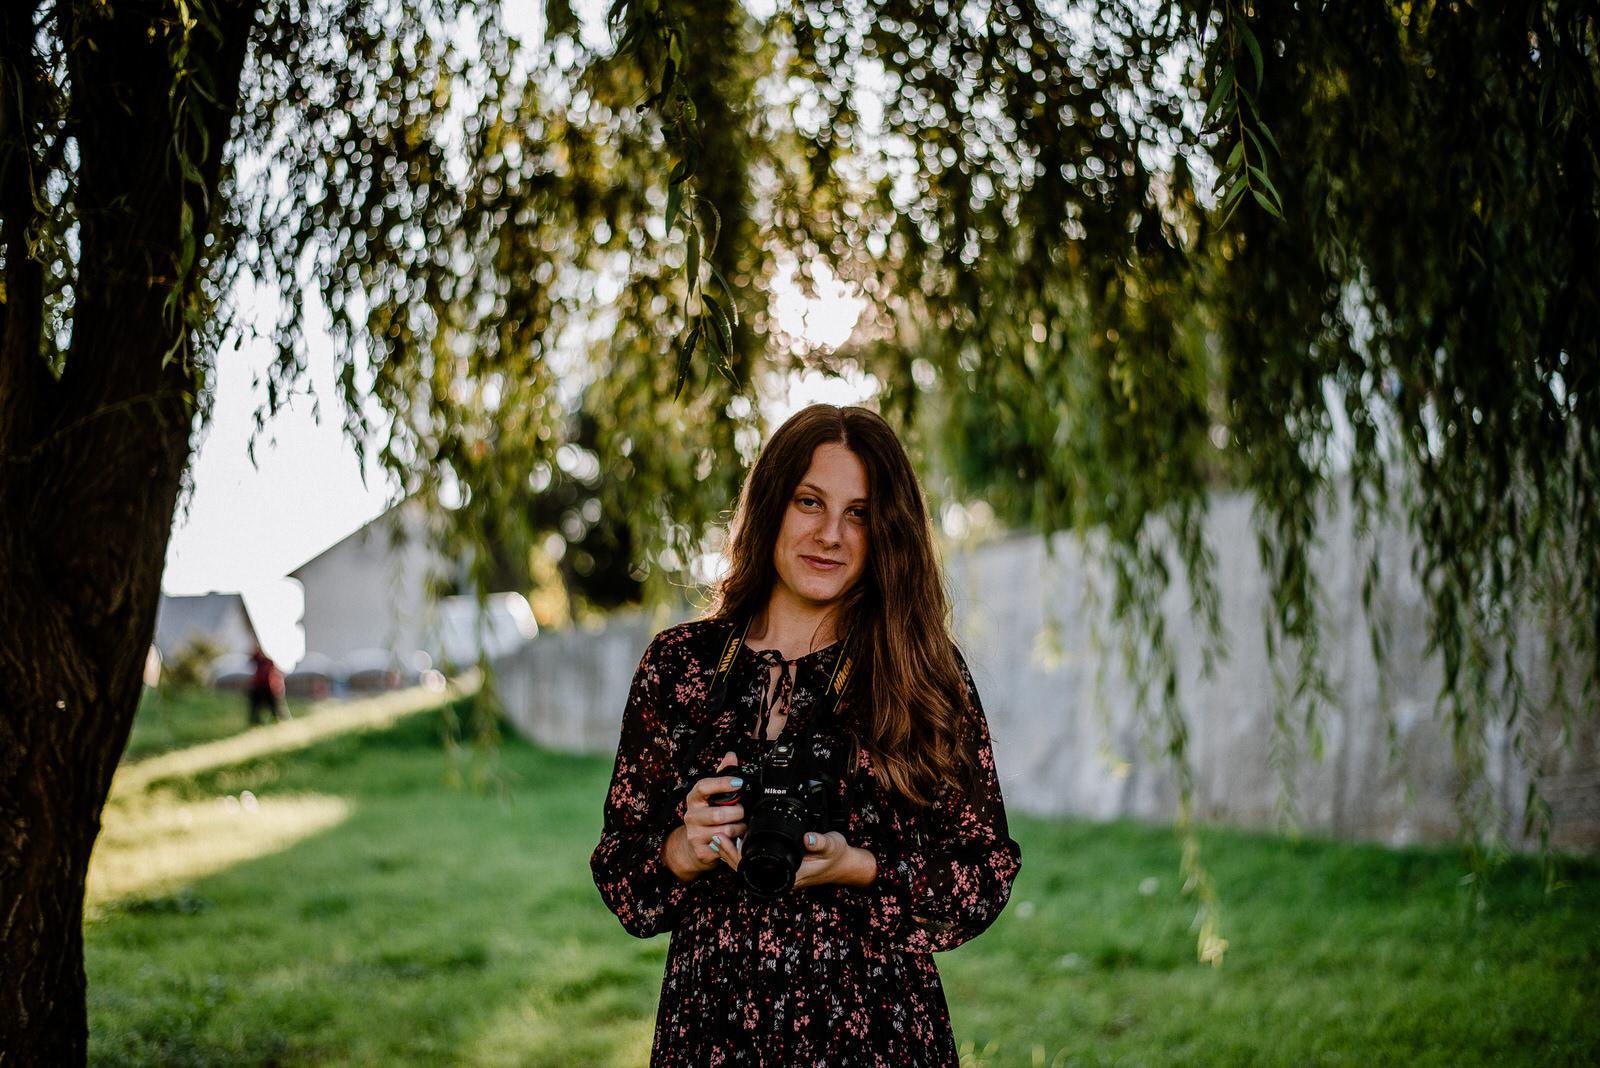 likaclub_intervju-tomislava-i-marija-maras_gospić_2019-1